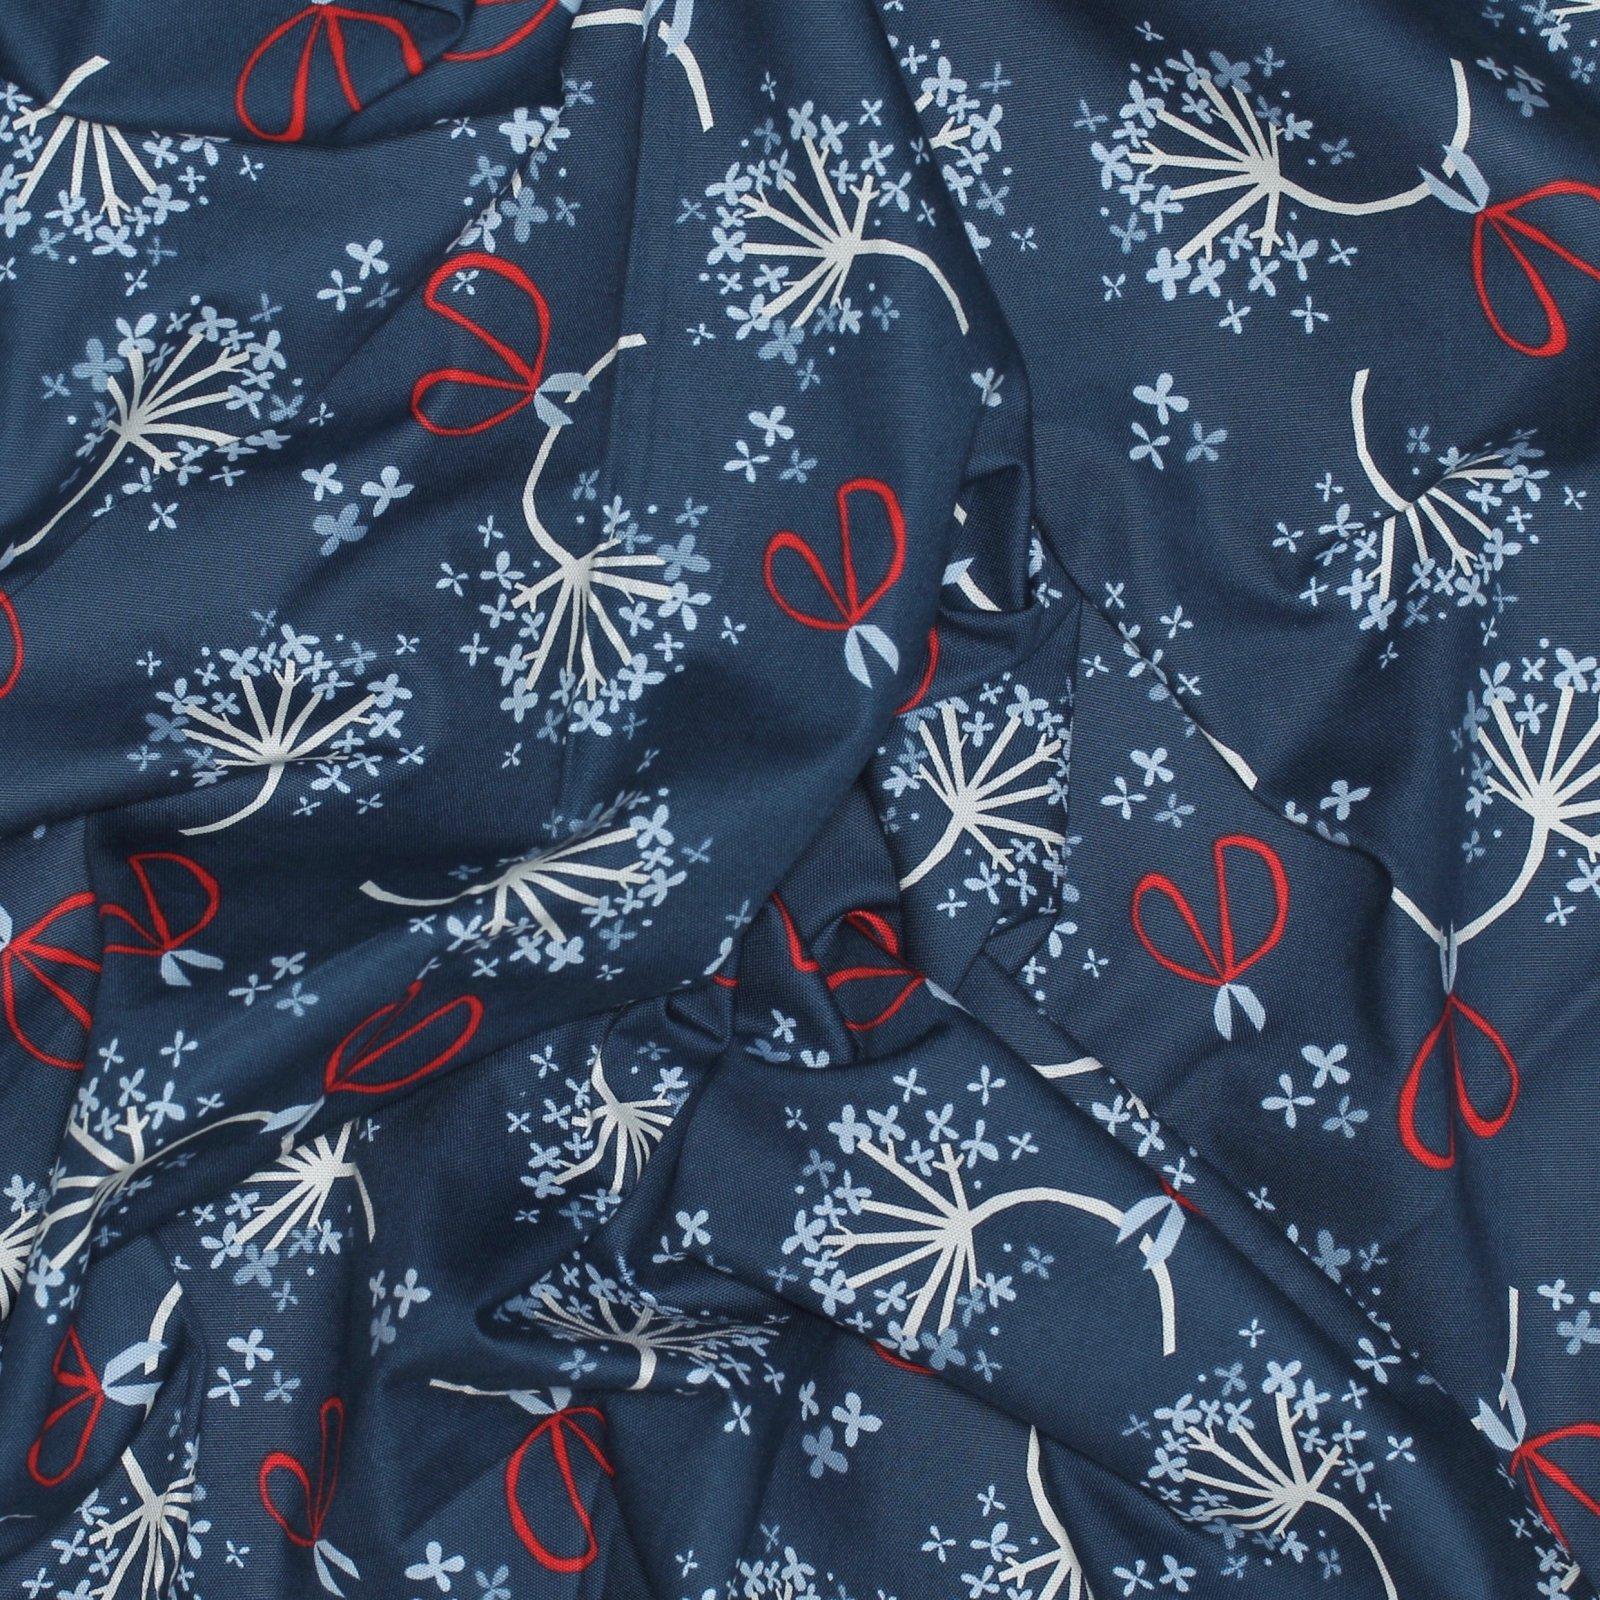 Monaluna Organic Fabric - Hydrangea Cotton Canvas